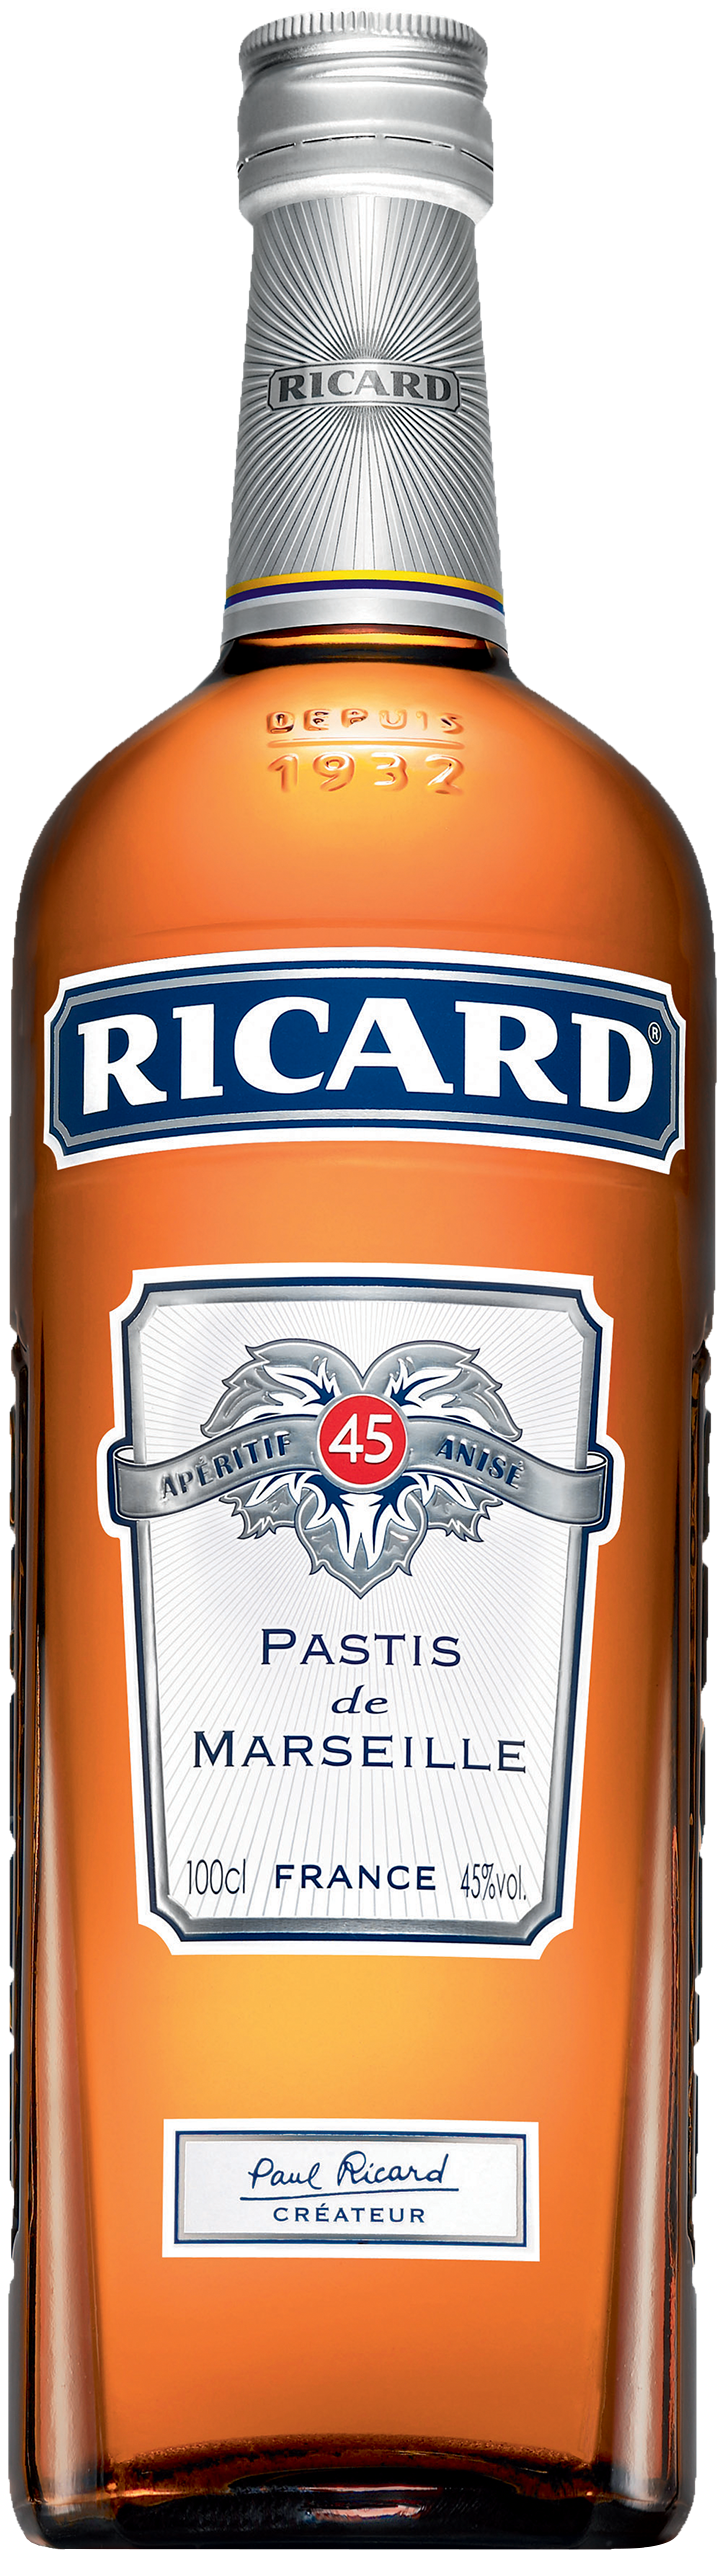 ricard-main